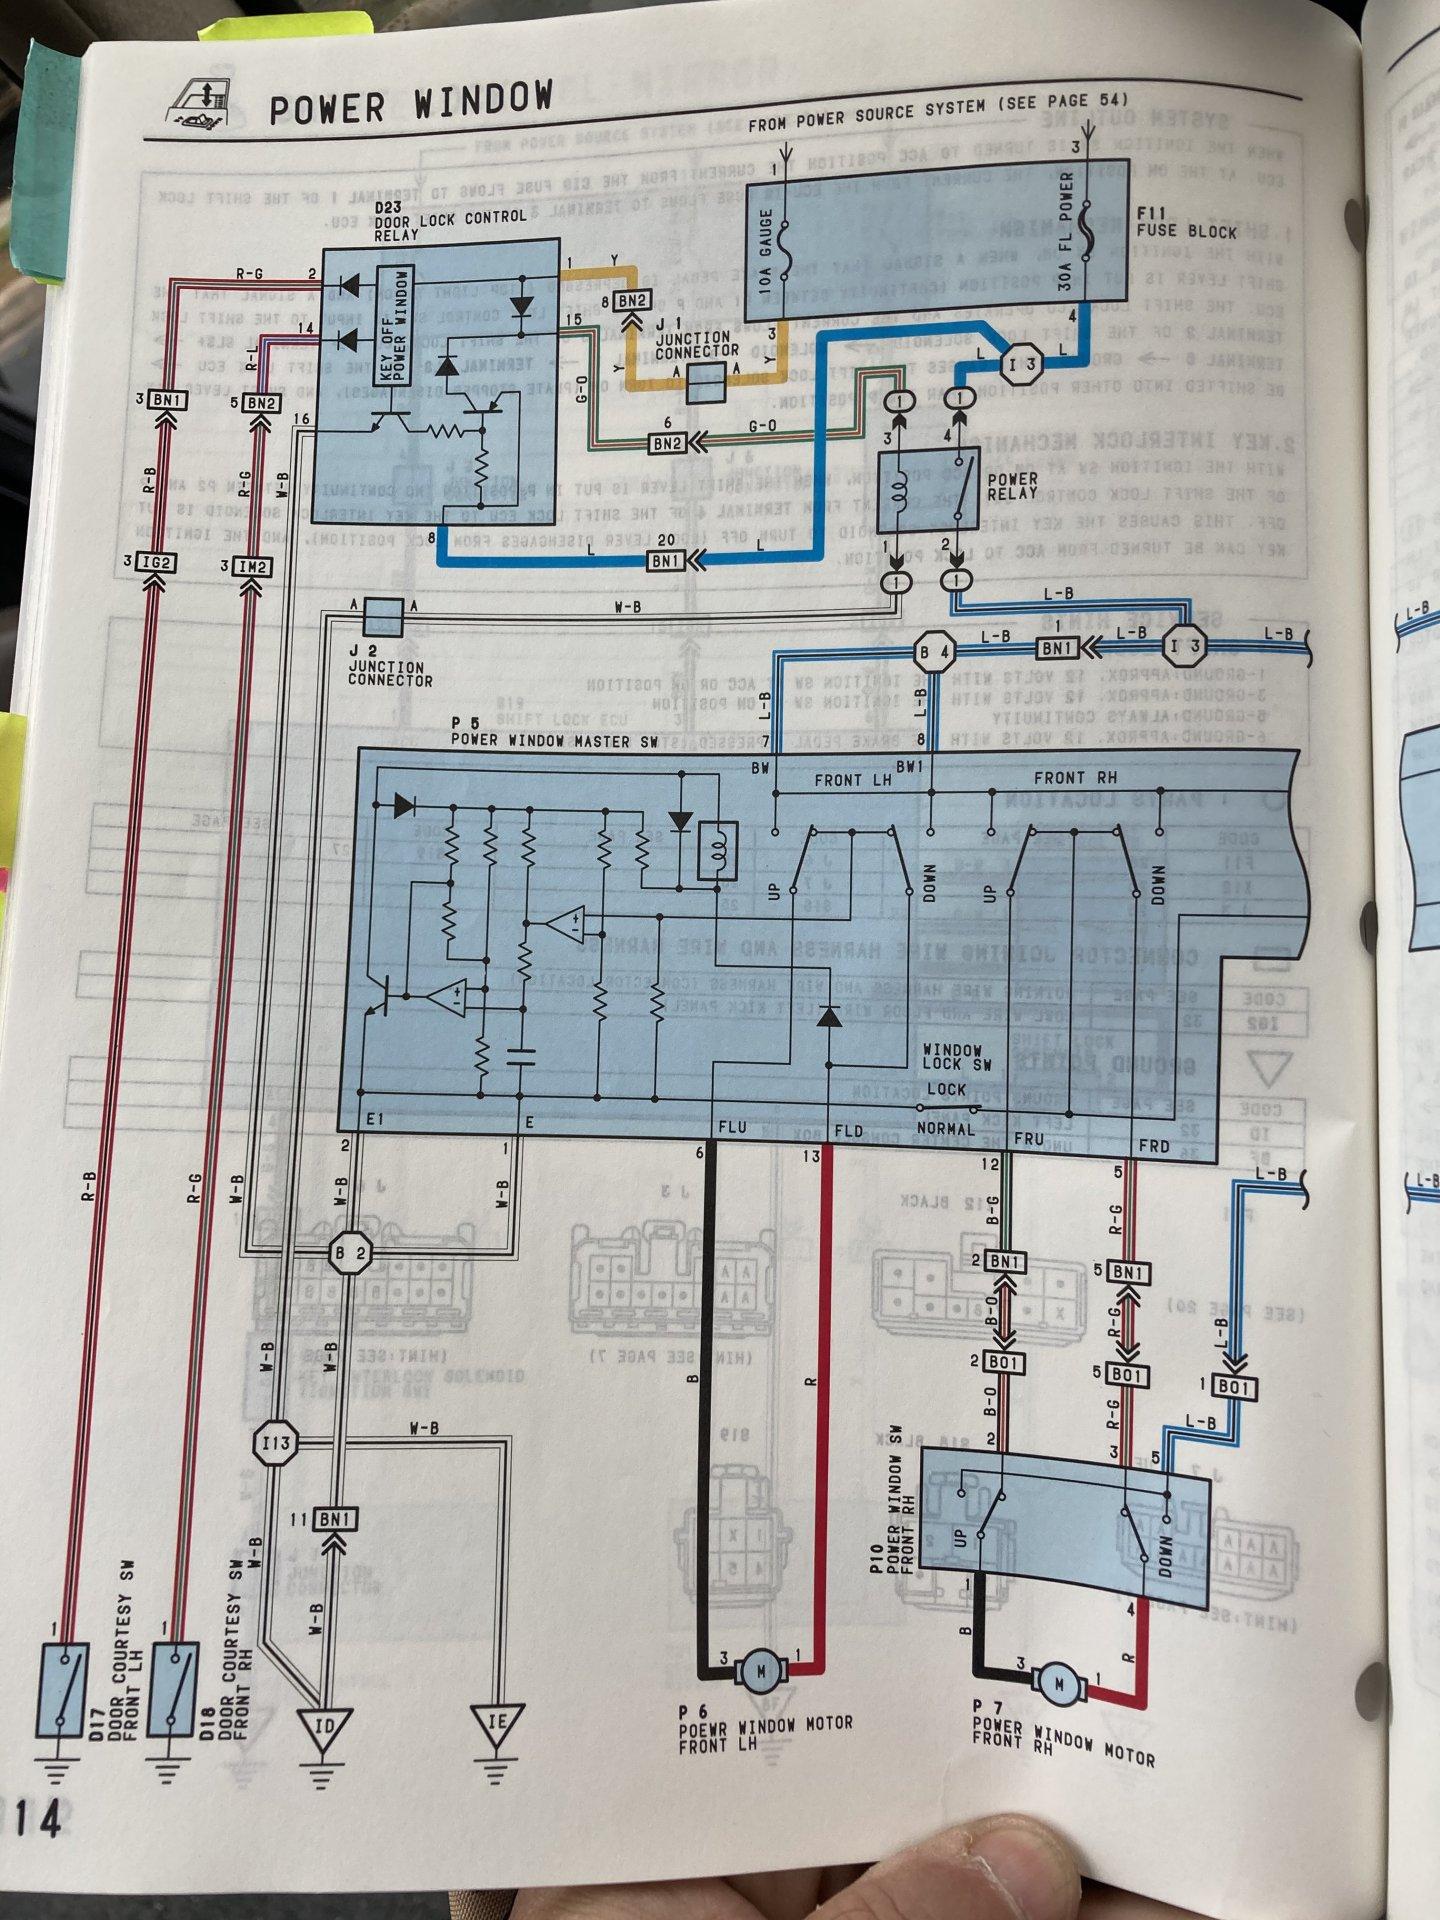 A62C7F9E-E26B-4A0A-B480-D53B560D39CB.jpeg